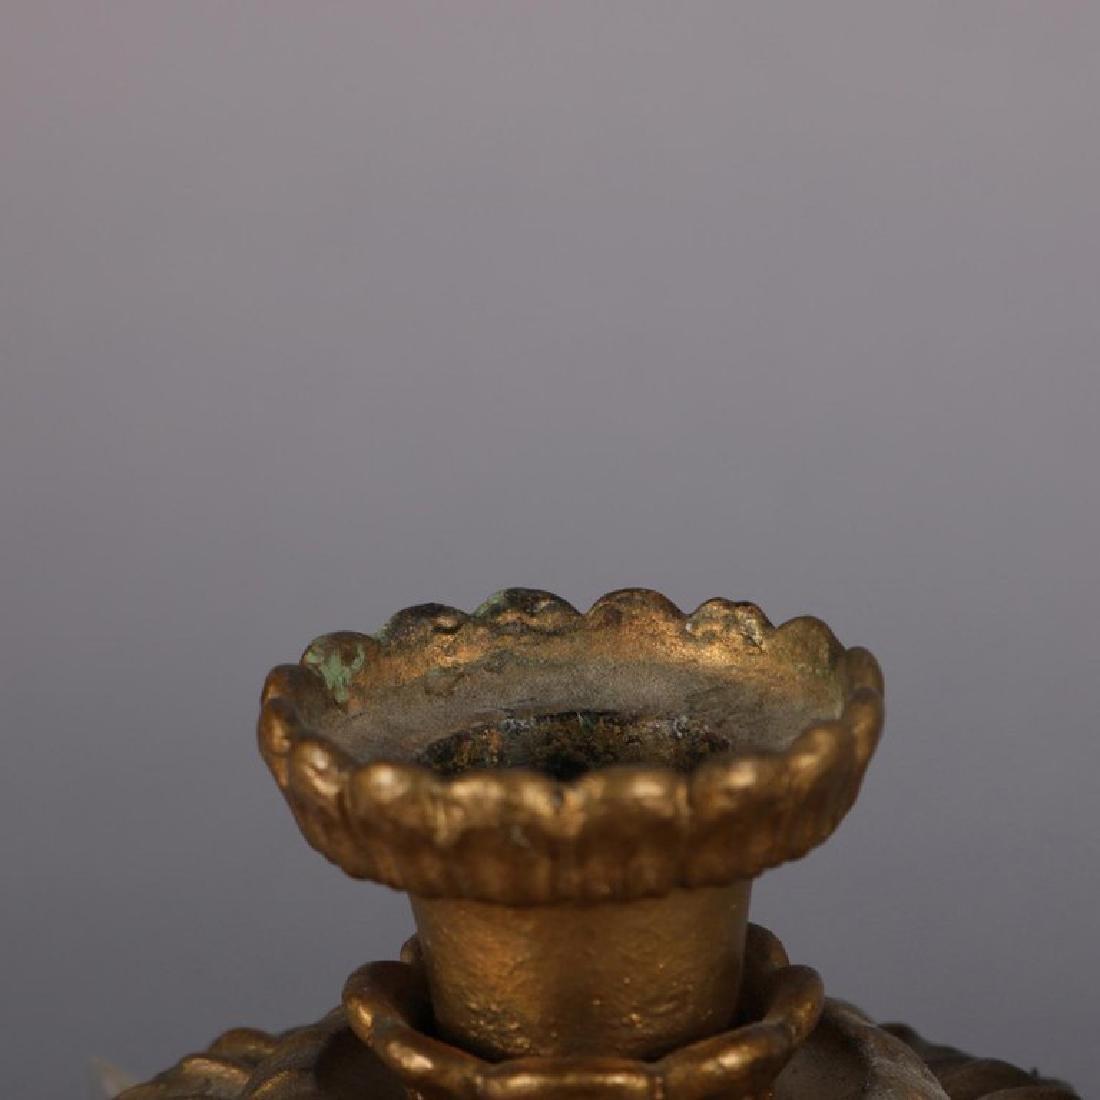 Antique French Gilt Metal & Crystal Figural Girandole - 10